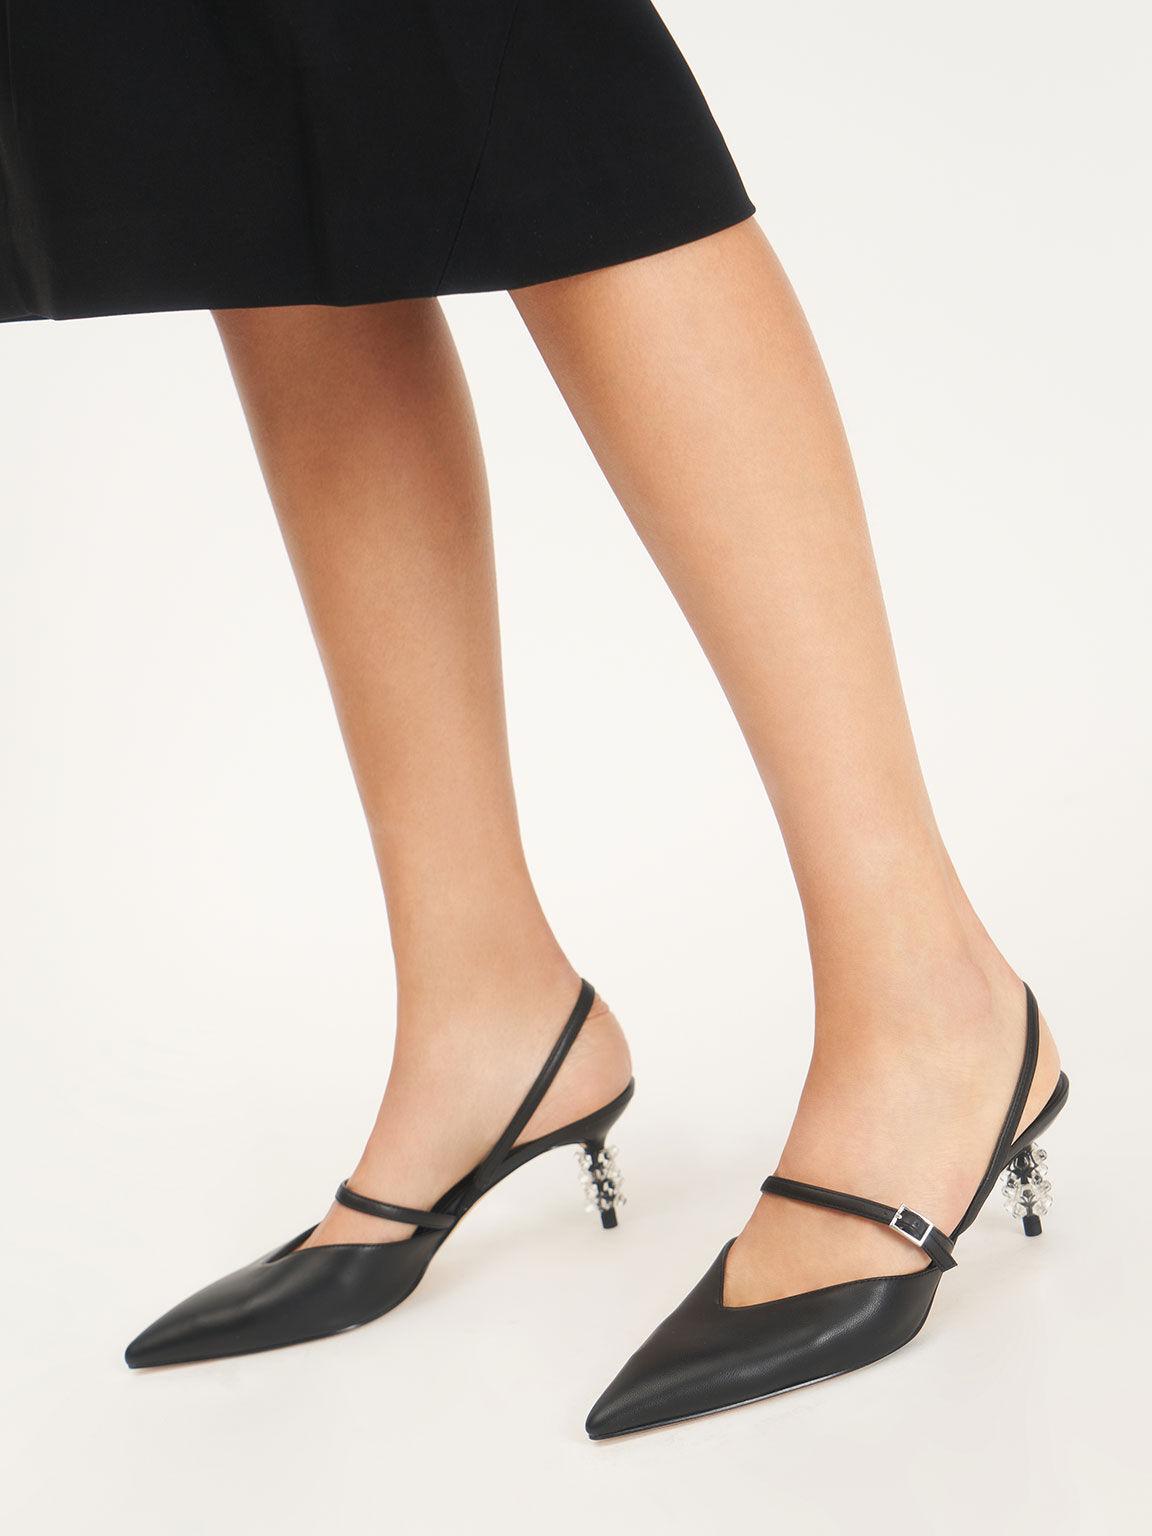 Geometric Heel Mary Janes, Black, hi-res